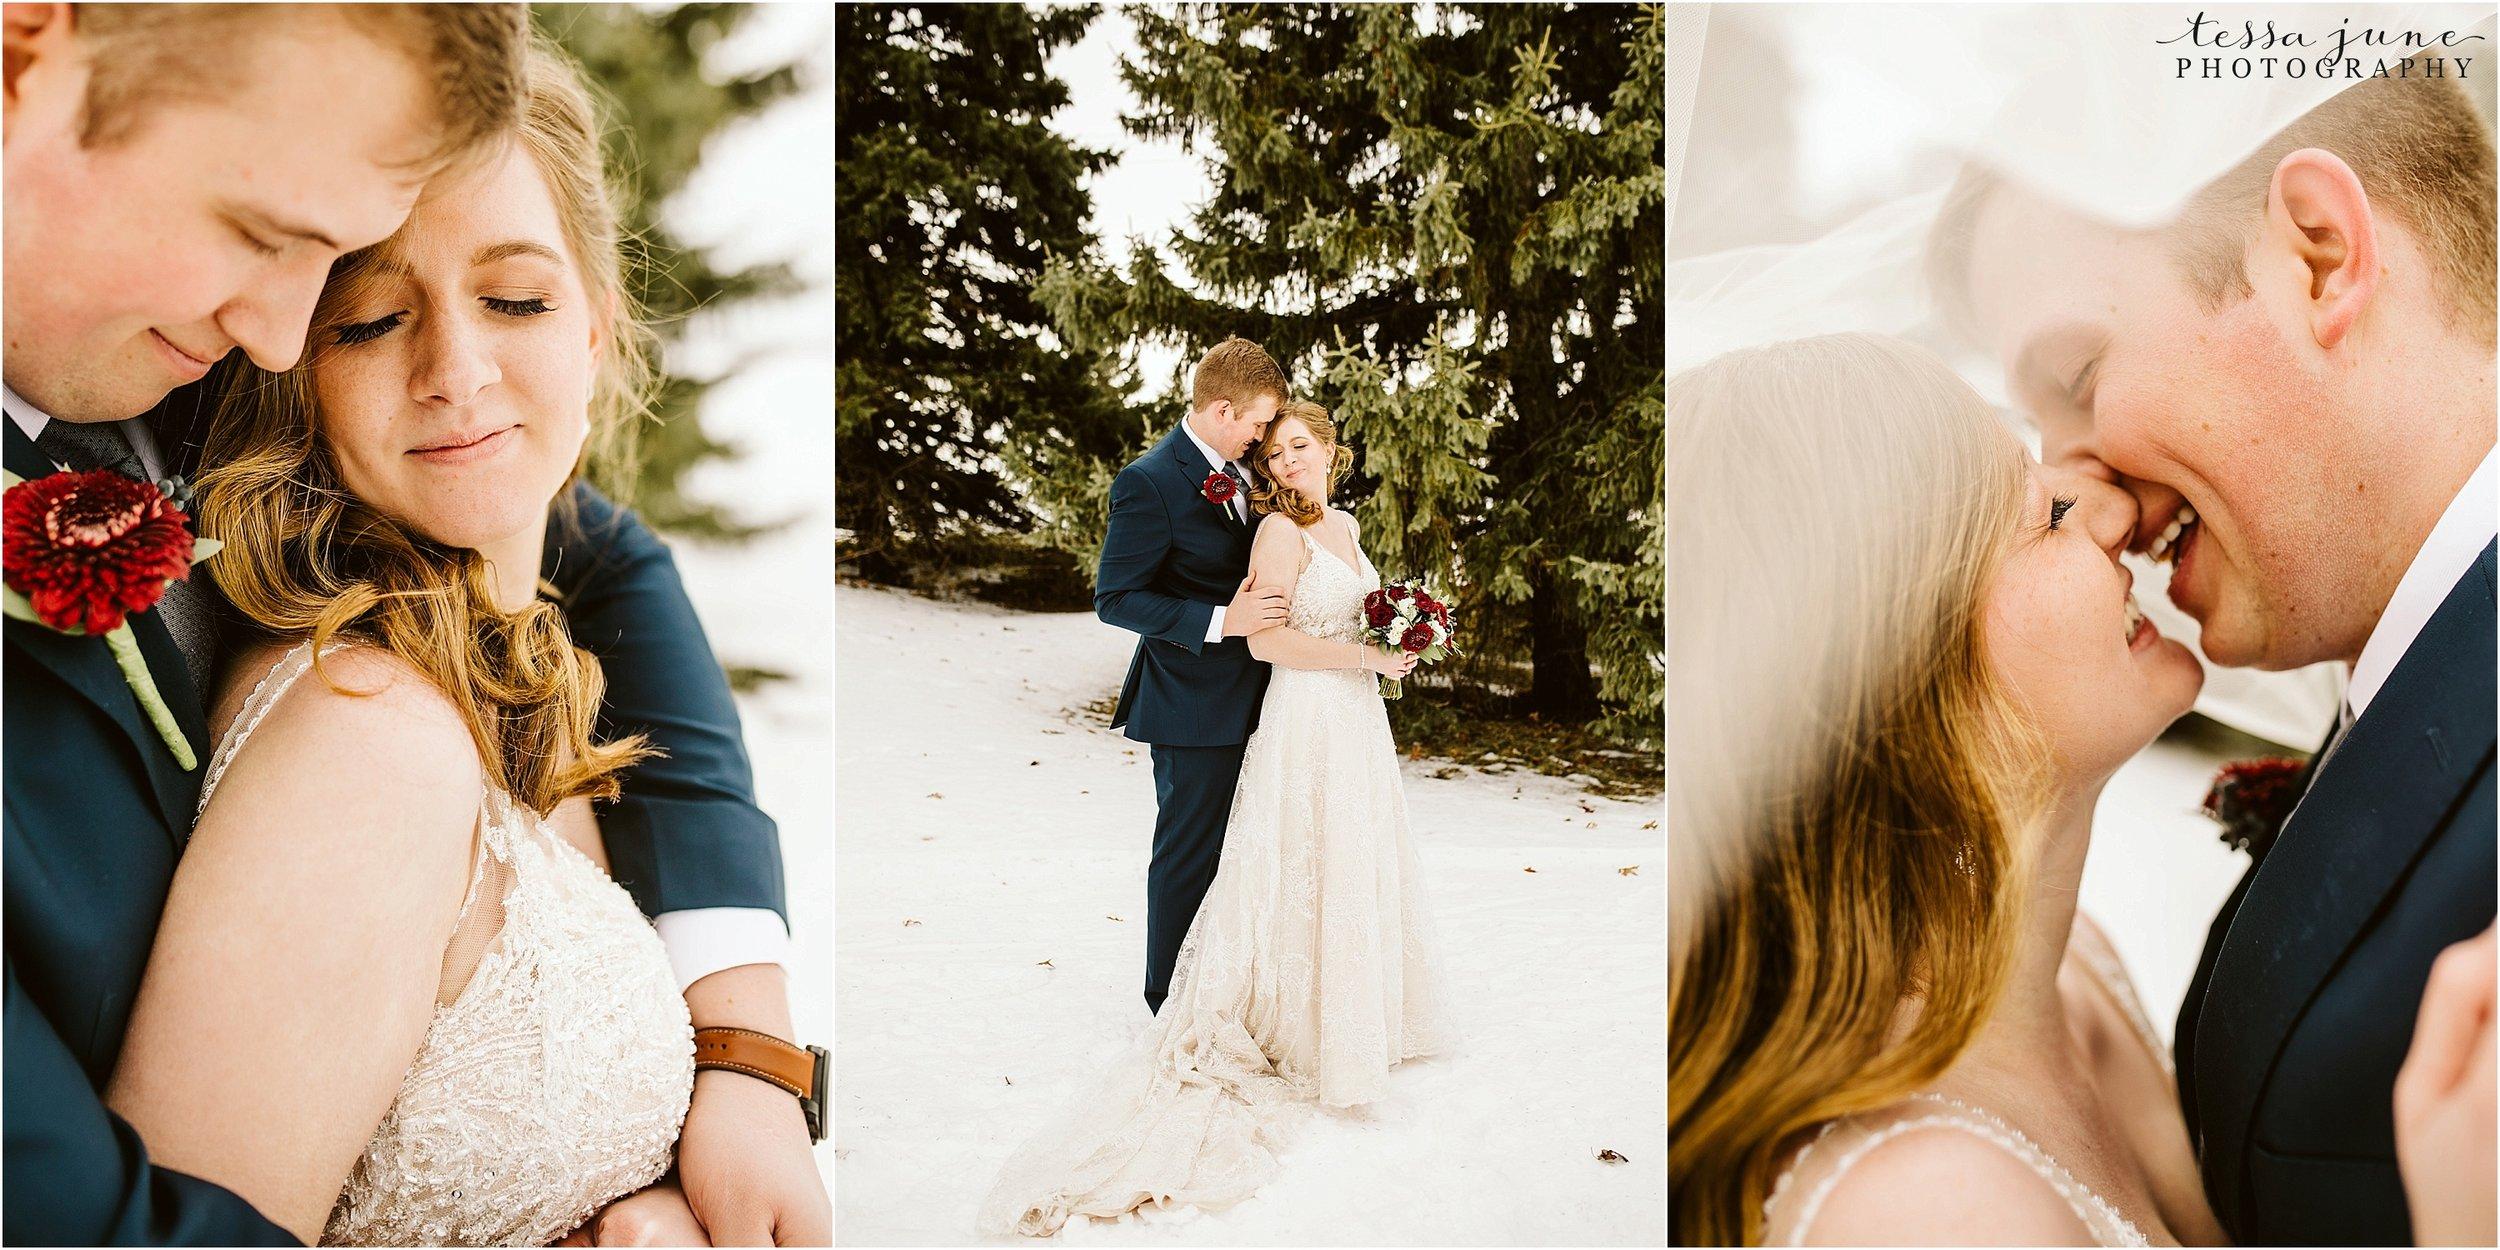 winter-wedding-in-eden-prairie-barn-minnesota-airplane-85.jpg